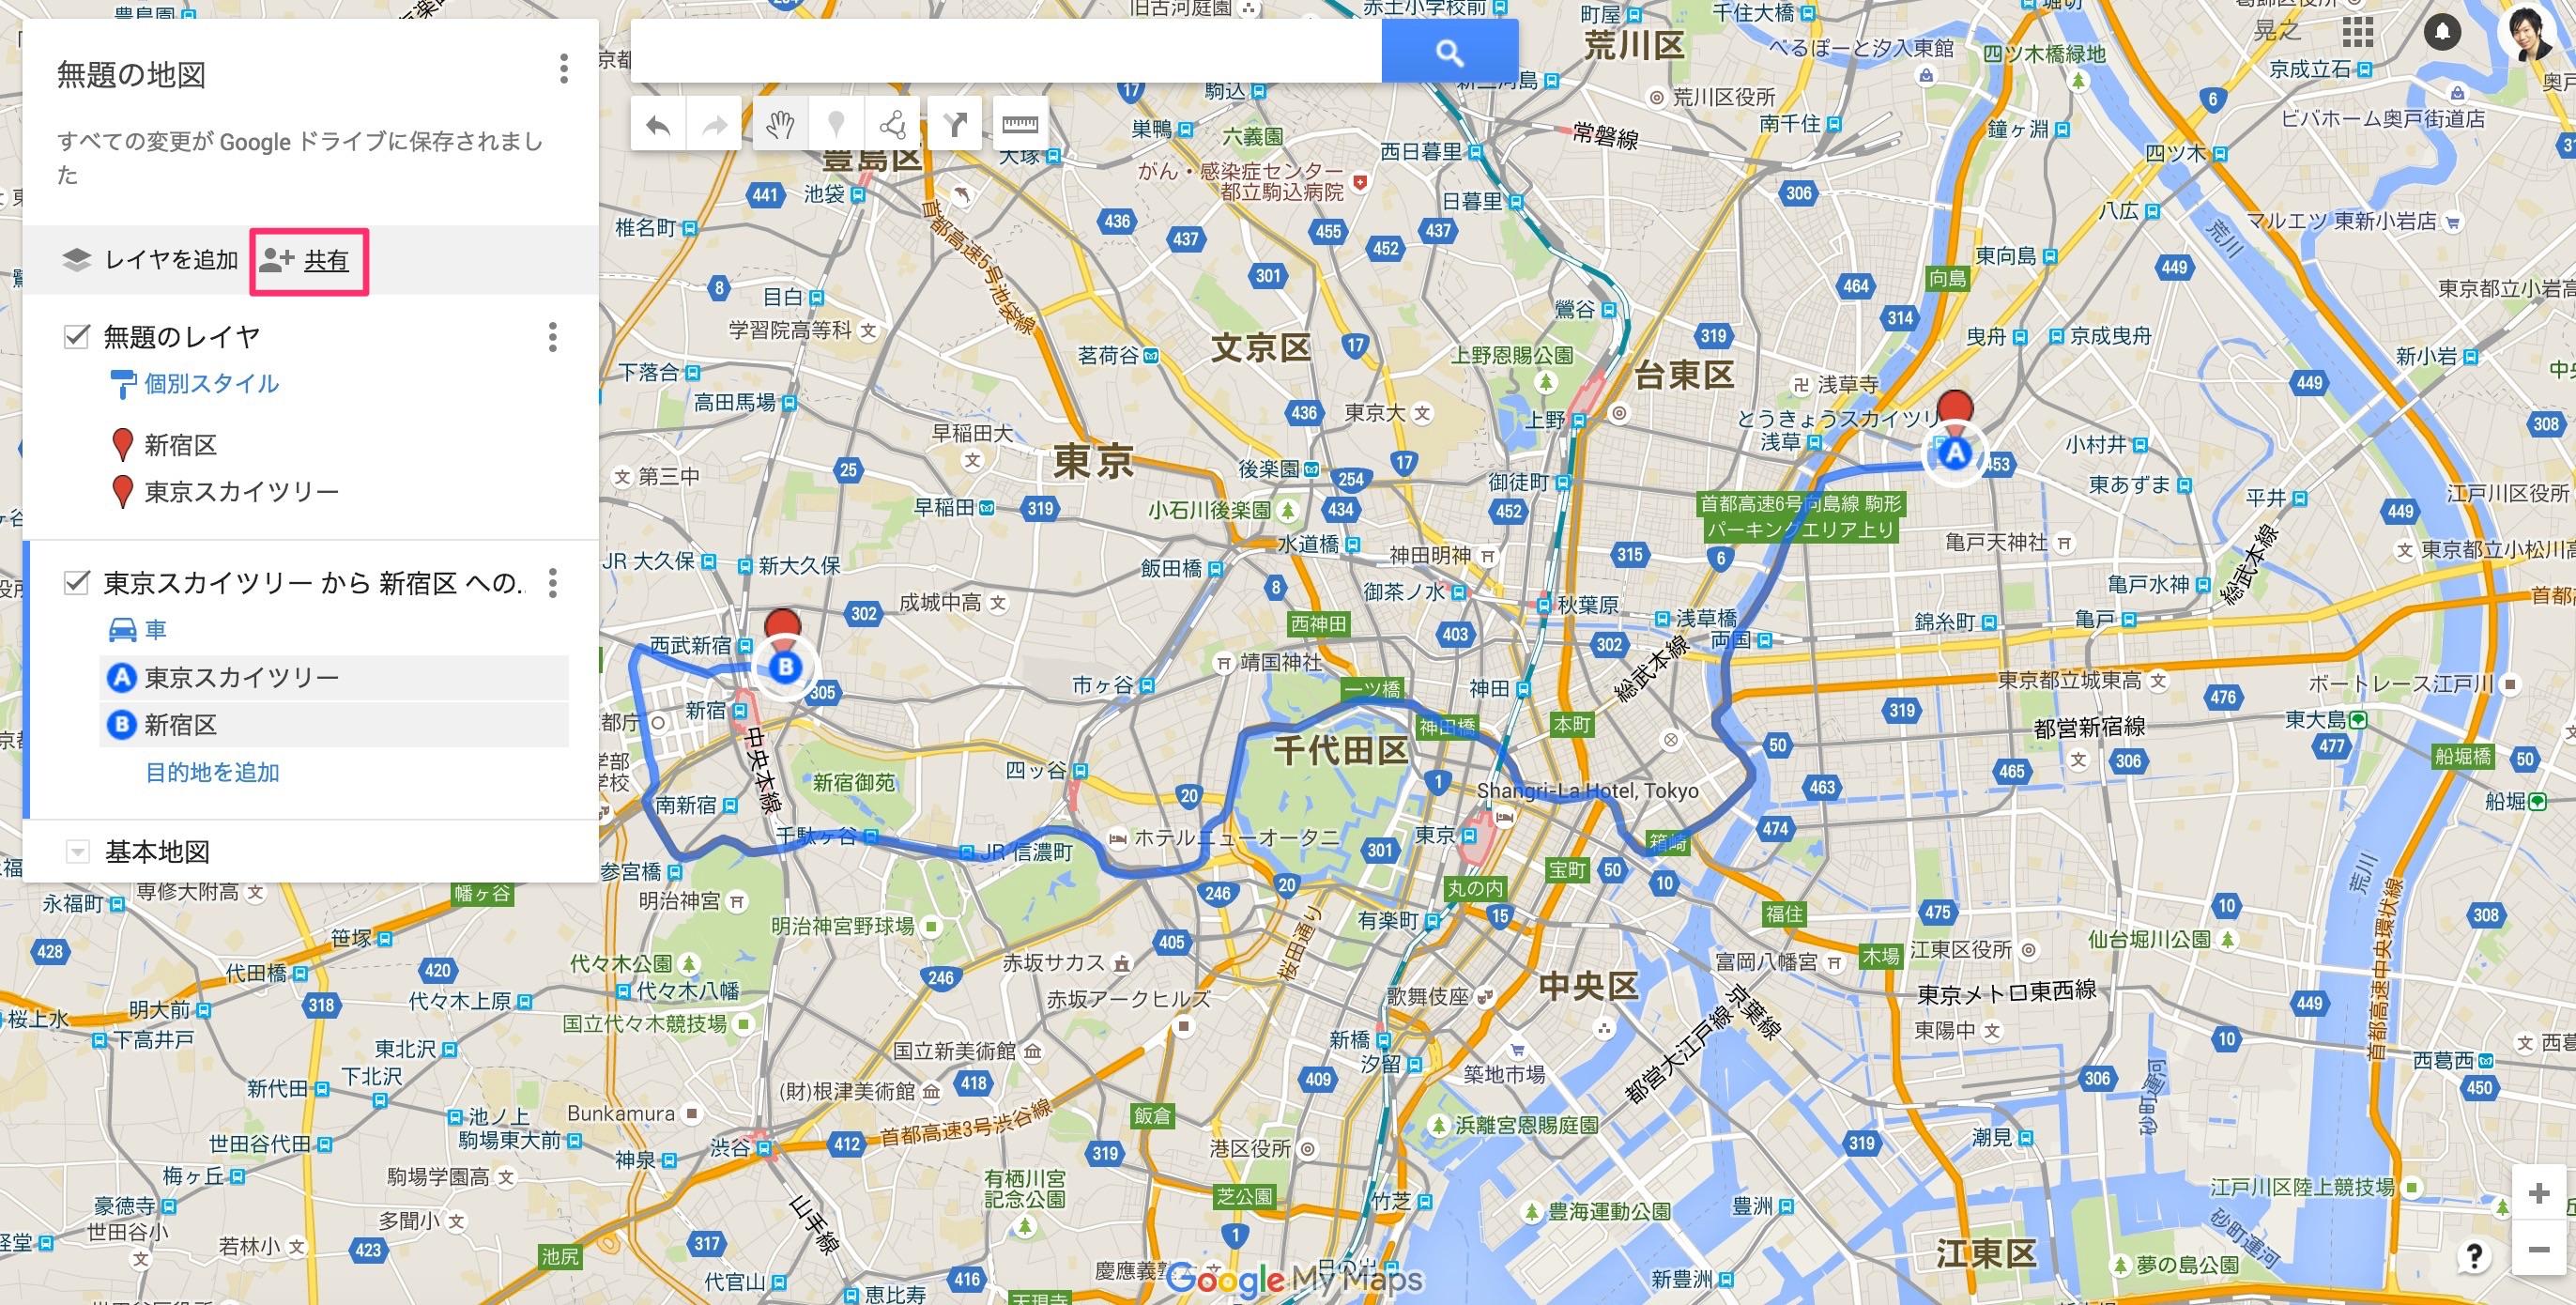 googlemapを共有